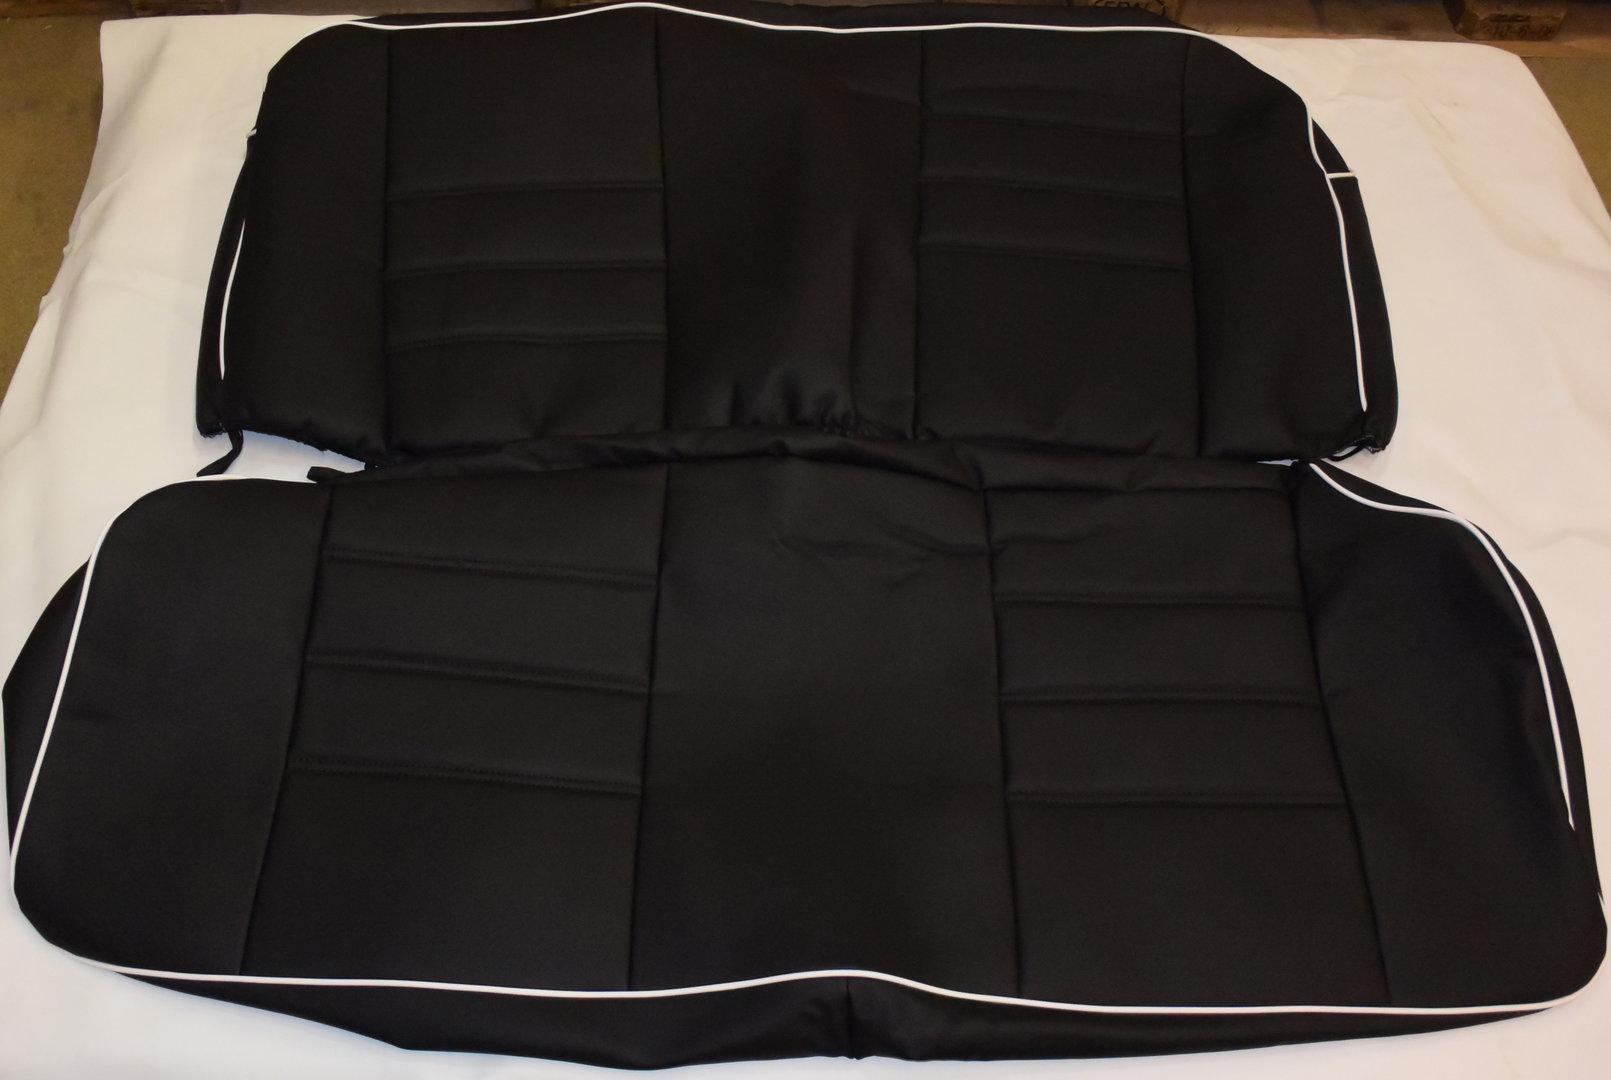 VW Käfer Limousine 08/57 - 07/64 Maß Sitzbezüge in schwarz